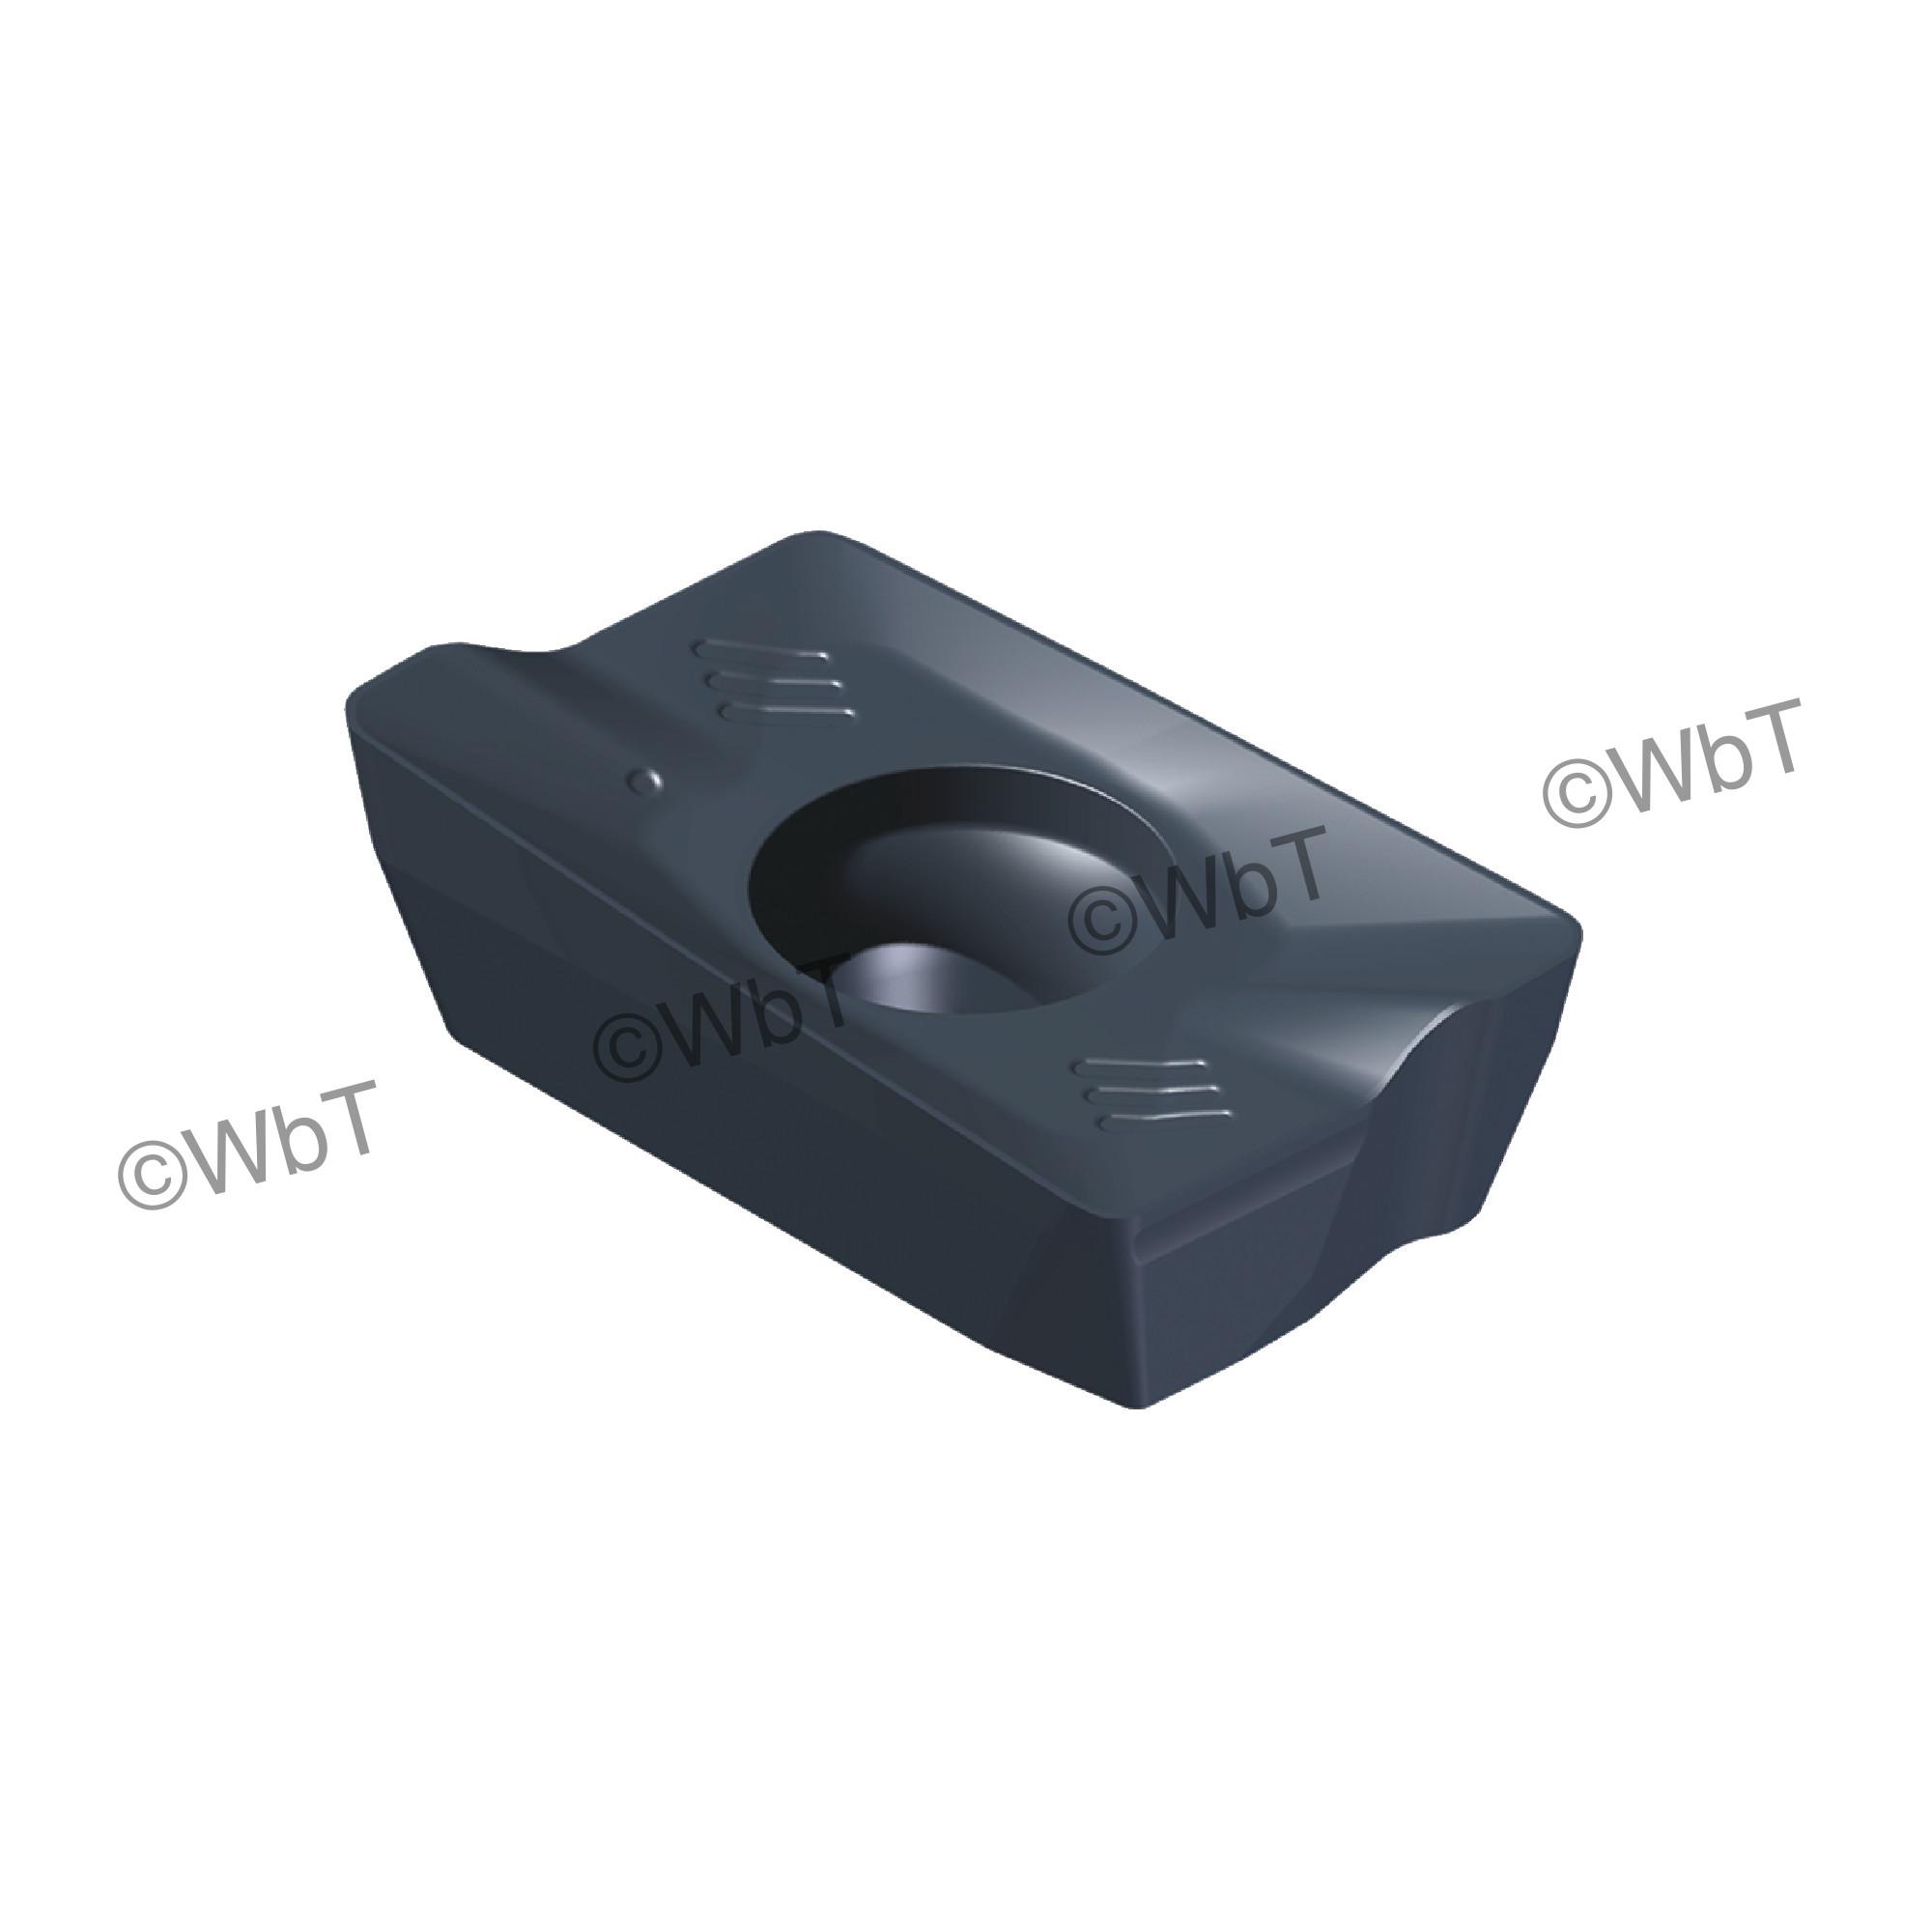 AKUMA - ADKT1505PDR-M1 PM20M Parallelogram / Indexable Carbide Milling Insert